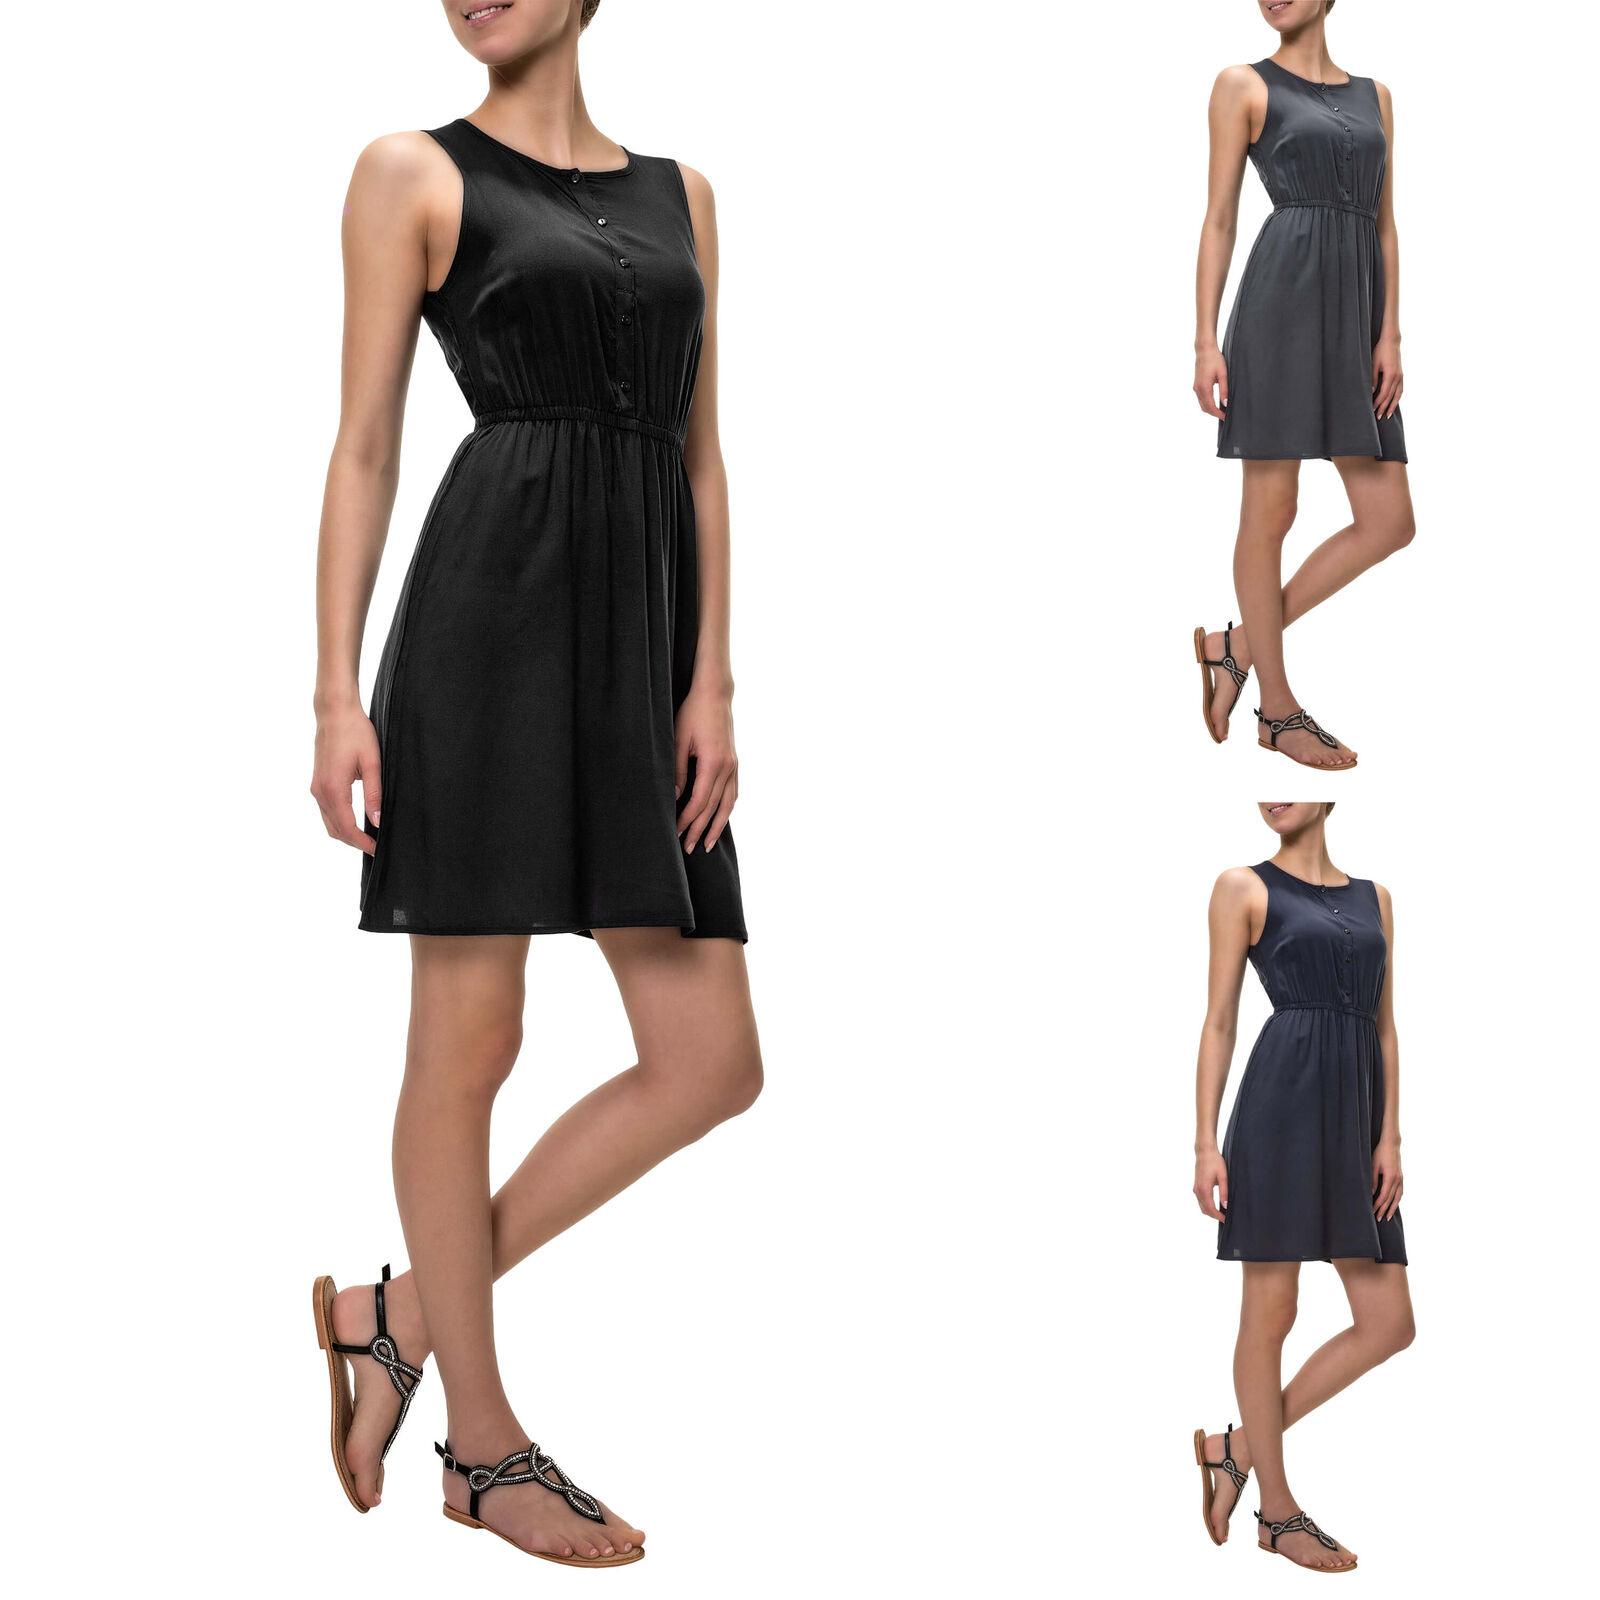 Vero Moda Damen Sommerkleid Print Kurzarm Cocktailkleid